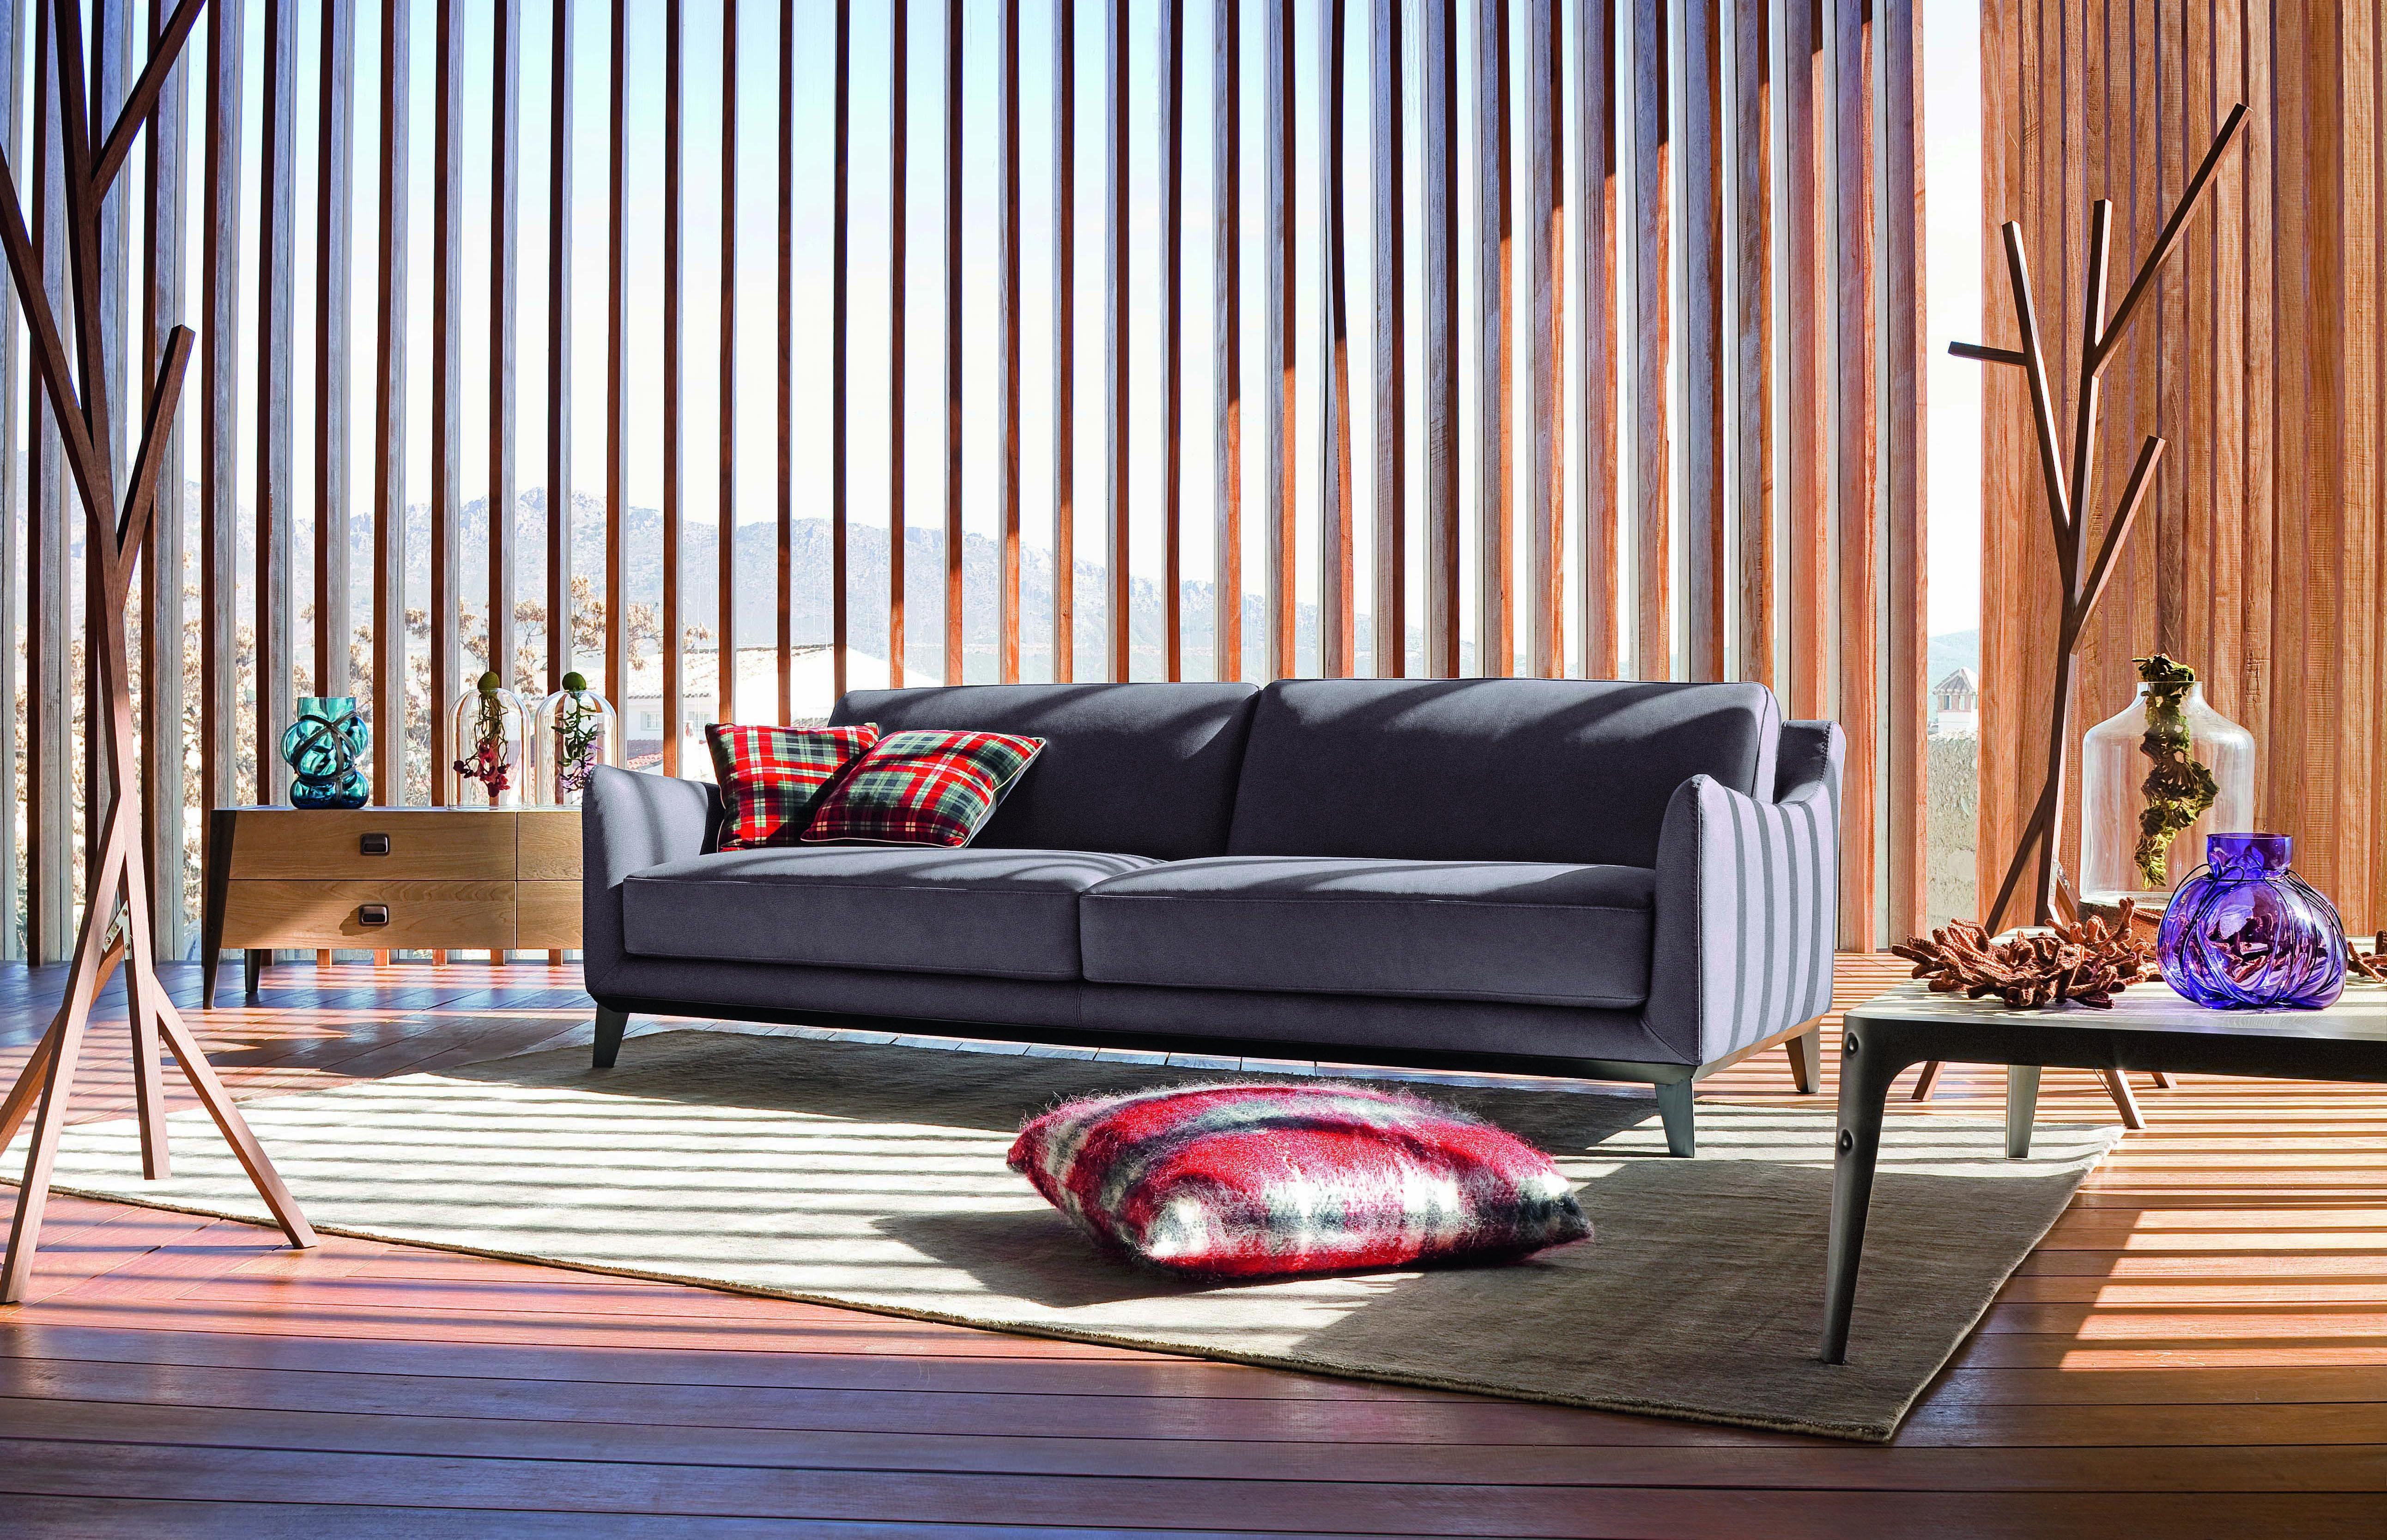 Roche Bobois Brisbane Sofa Upholstered In Leather Design Philippe Bouix Rochebobois Leather Sofa Livingroom Philippebo Sofa Furniture Interior Design